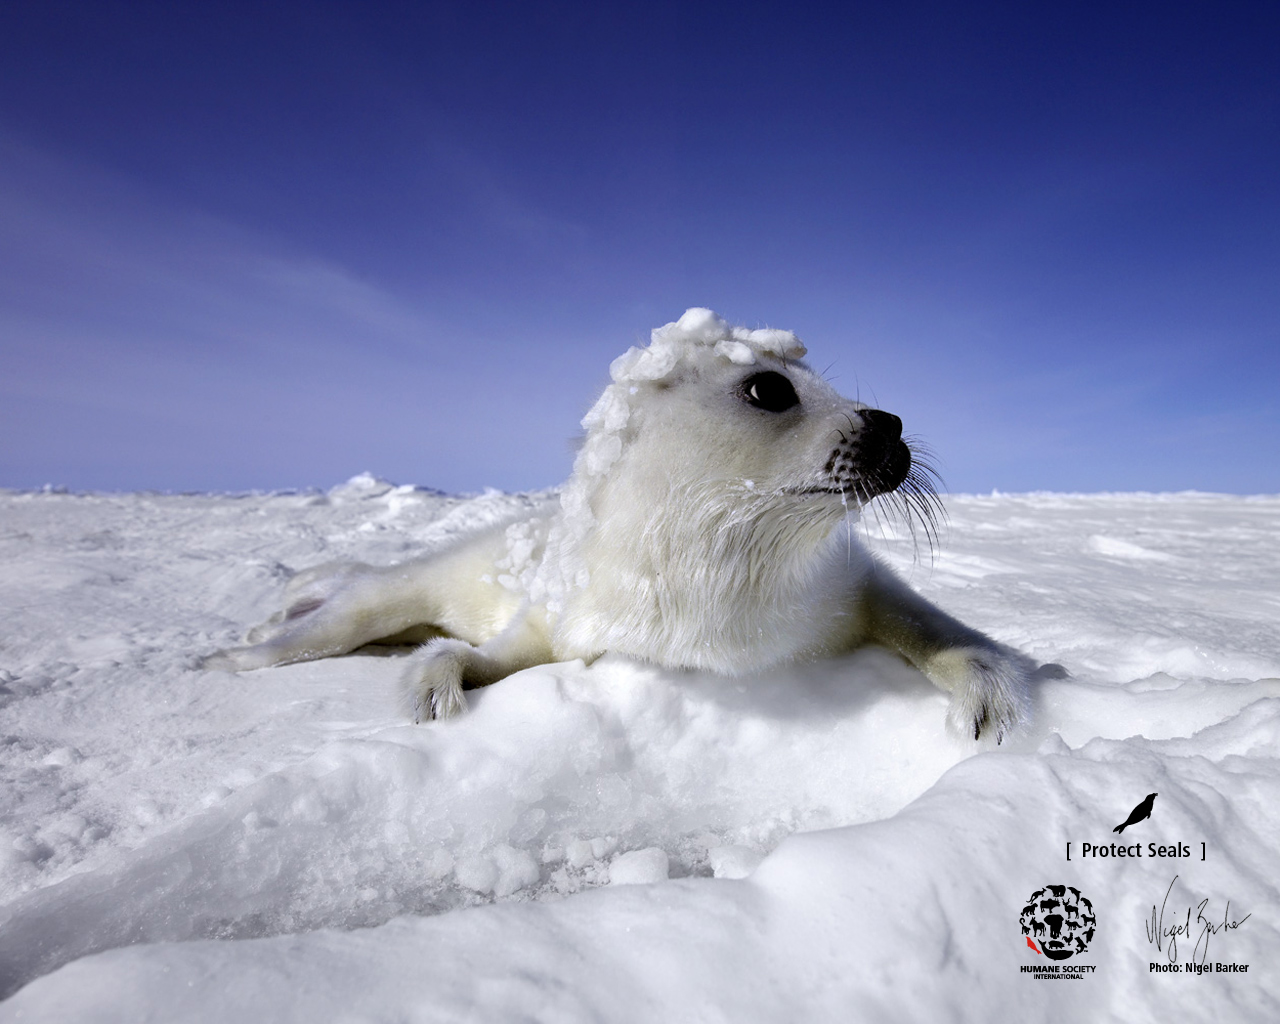 Seal Wallpaper by Nigel Barker : Humane Society International.